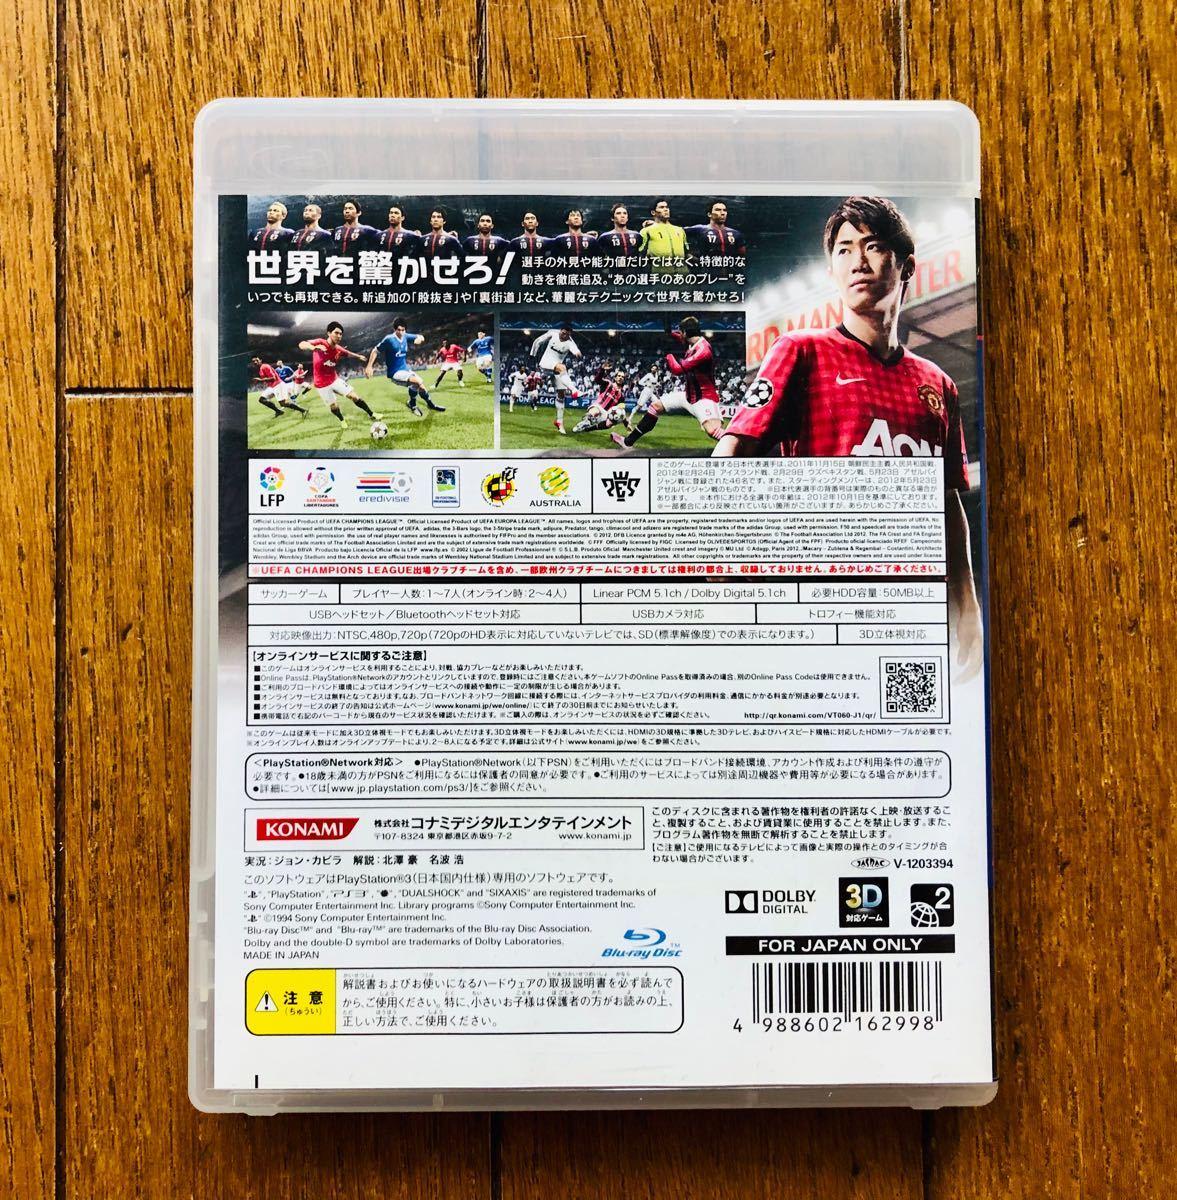 PS3 本体 + ソフト1本  SONY CECH-3000A